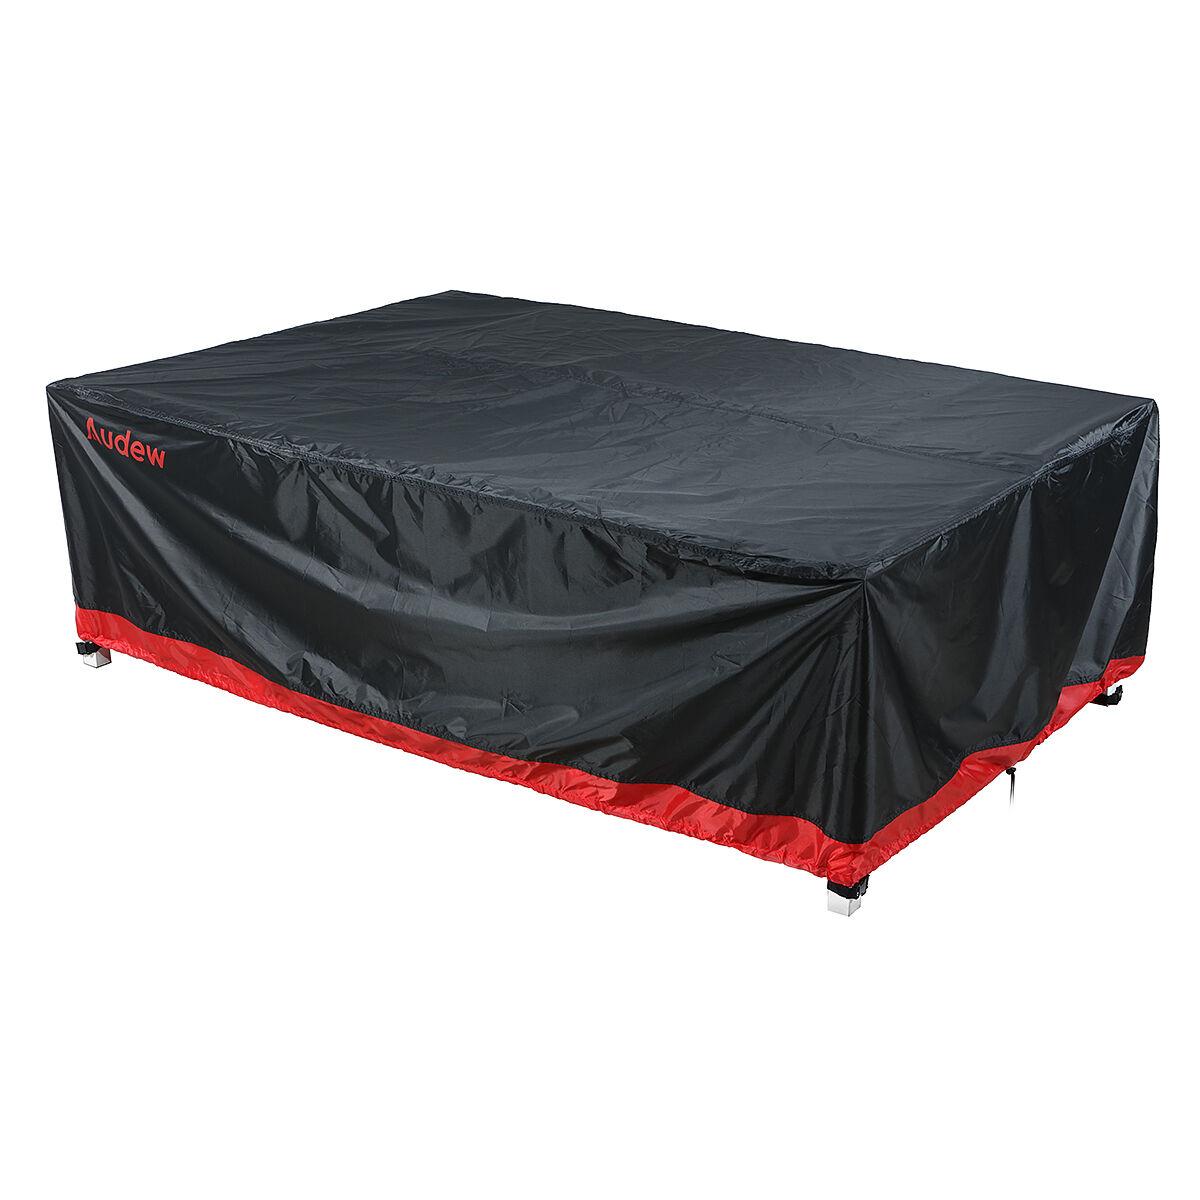 "Audew 90.5""L x 64.5""D x 28.5""H 6-8 Seats Oxford Fabric Patio Furniture Covers, Black & Red"